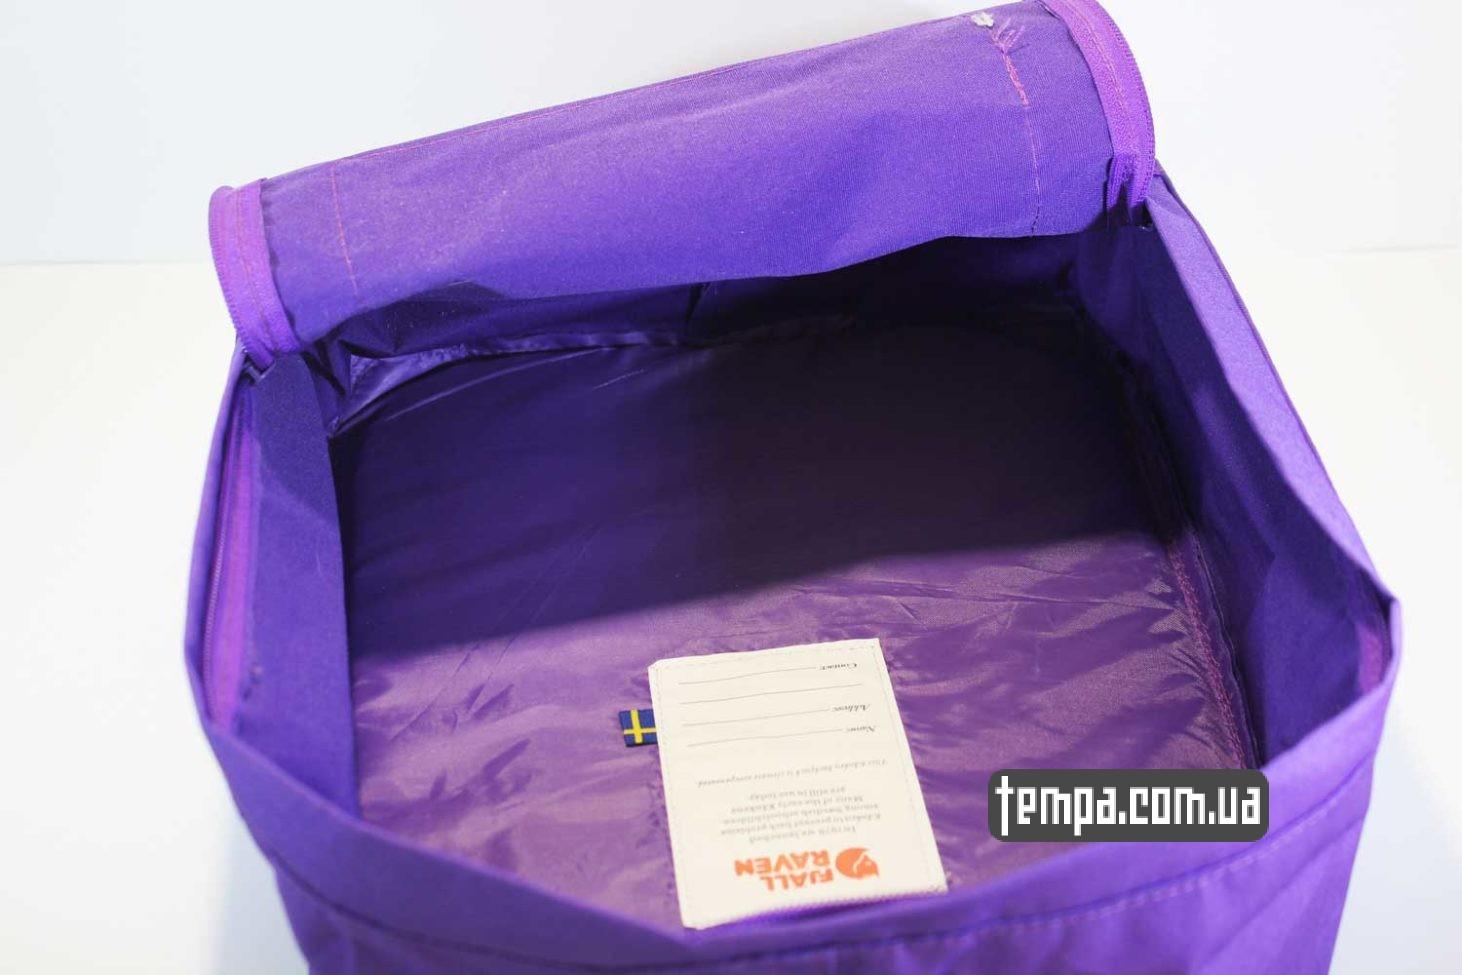 classic рюкзак re kanken fjallraven purple сиреневый фиолетовый